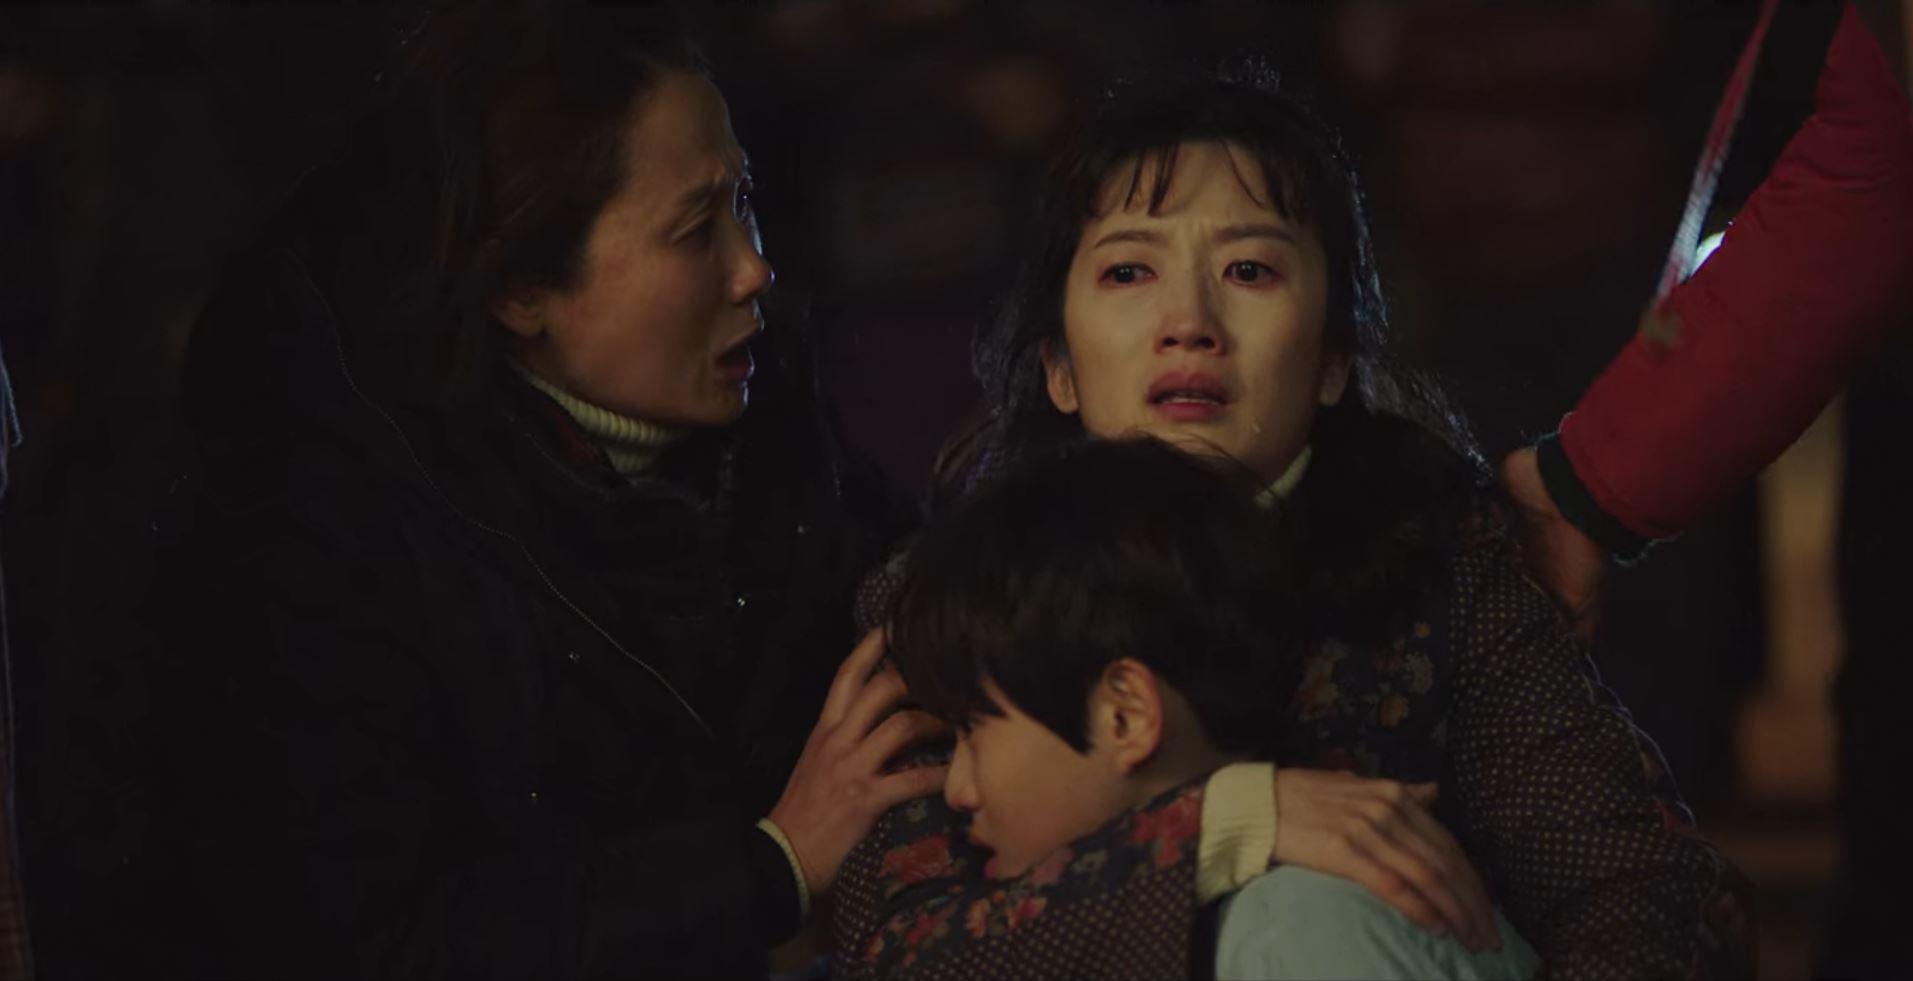 Oh Han-Kyul, Jang So-Yeon, and Kim Sun-Young in Crash Landing on You (2019)